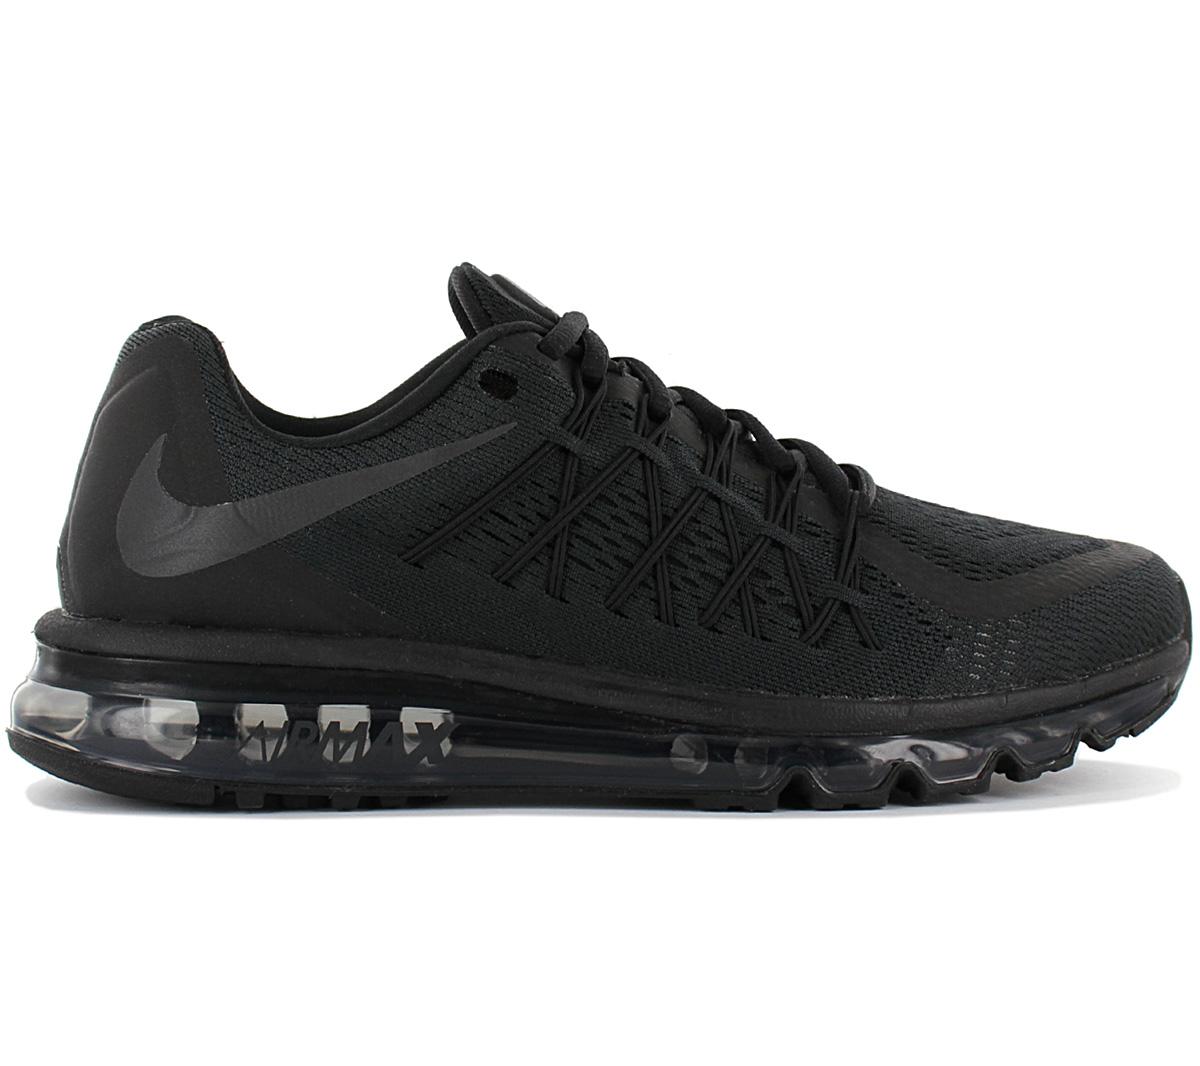 Details zu Nike Air Max 2015 Herren Sneaker BQ7548 002 Schwarz Schuhe Turnschuhe Sportschuh